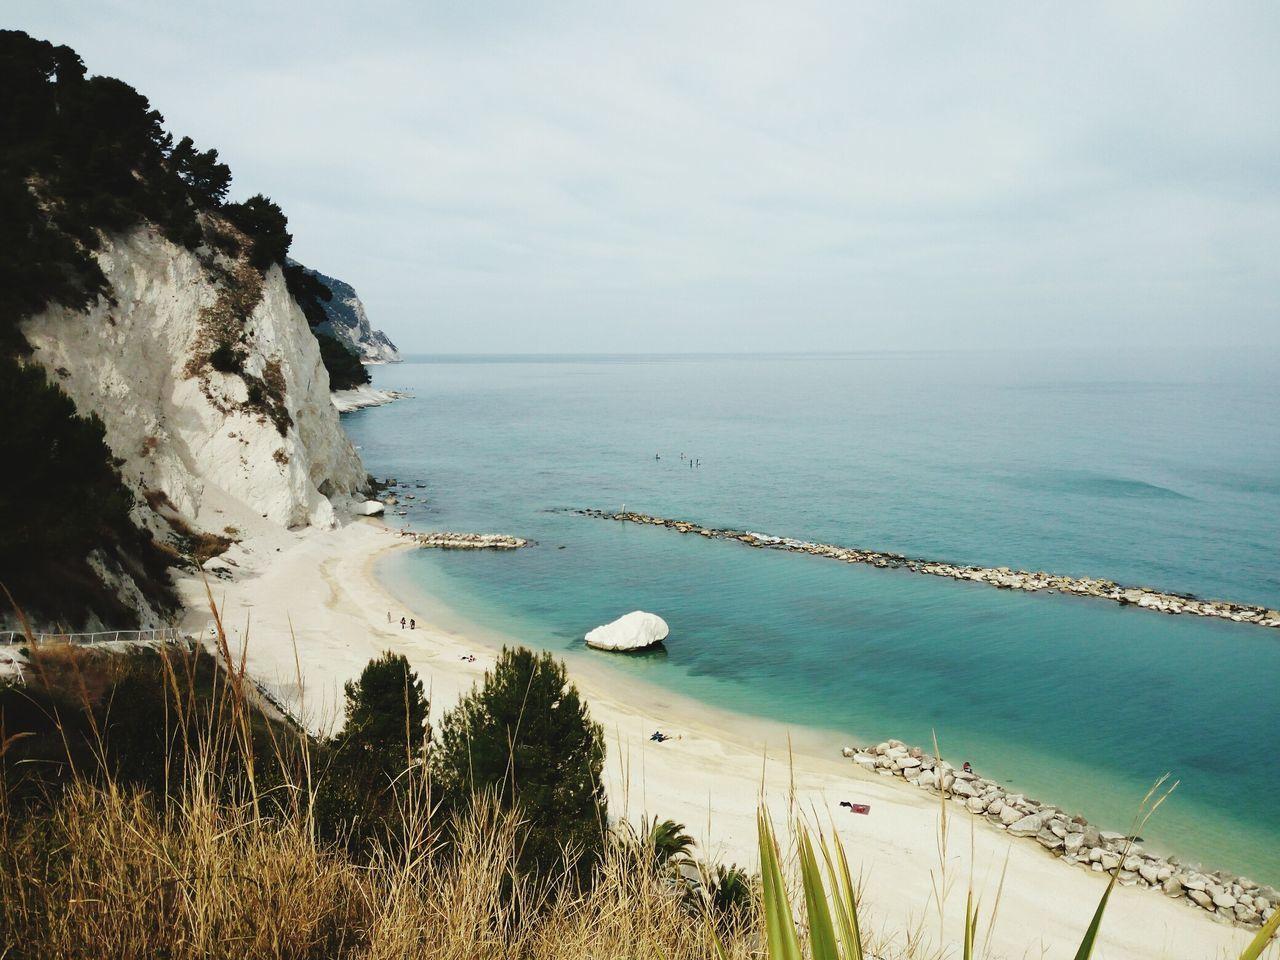 💕 Conero Numana Mare EyeEmNewHere Nature Beautiful Taking Photos Outdoors Tranquility Sea And Sky Monte Monte Conero Beautiful Sea View Scenics Close-up Costa Adriatic Sea